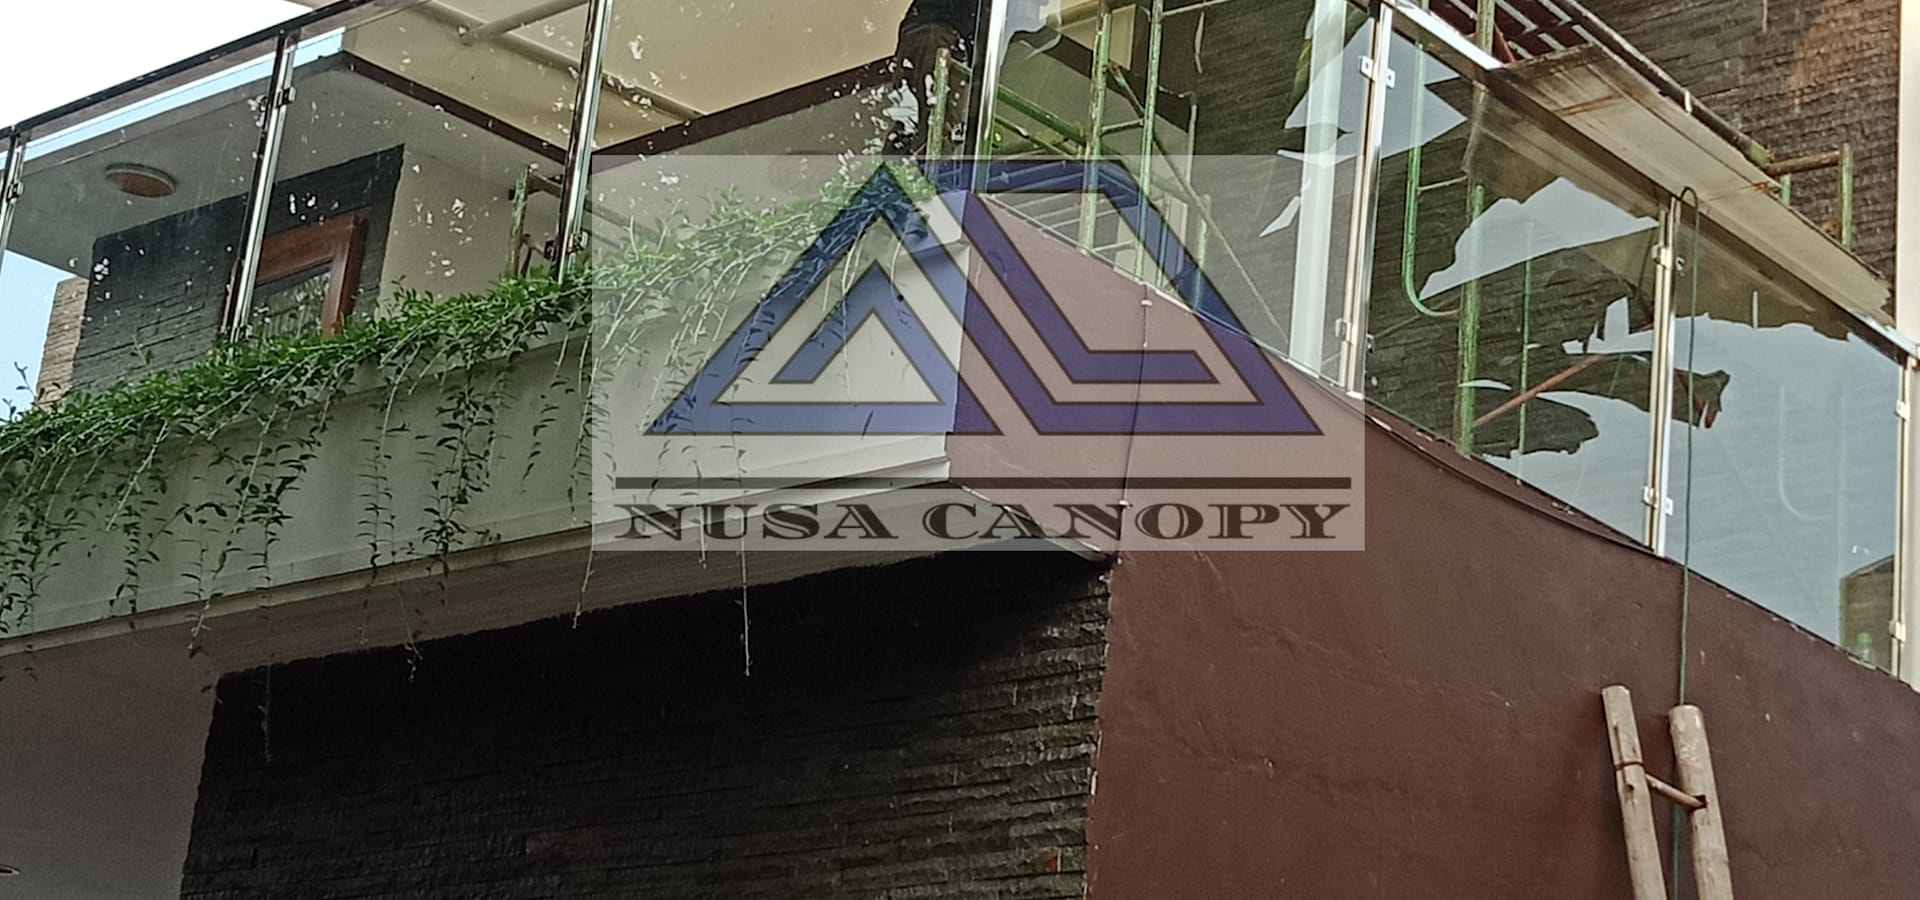 NUSA CANOPY